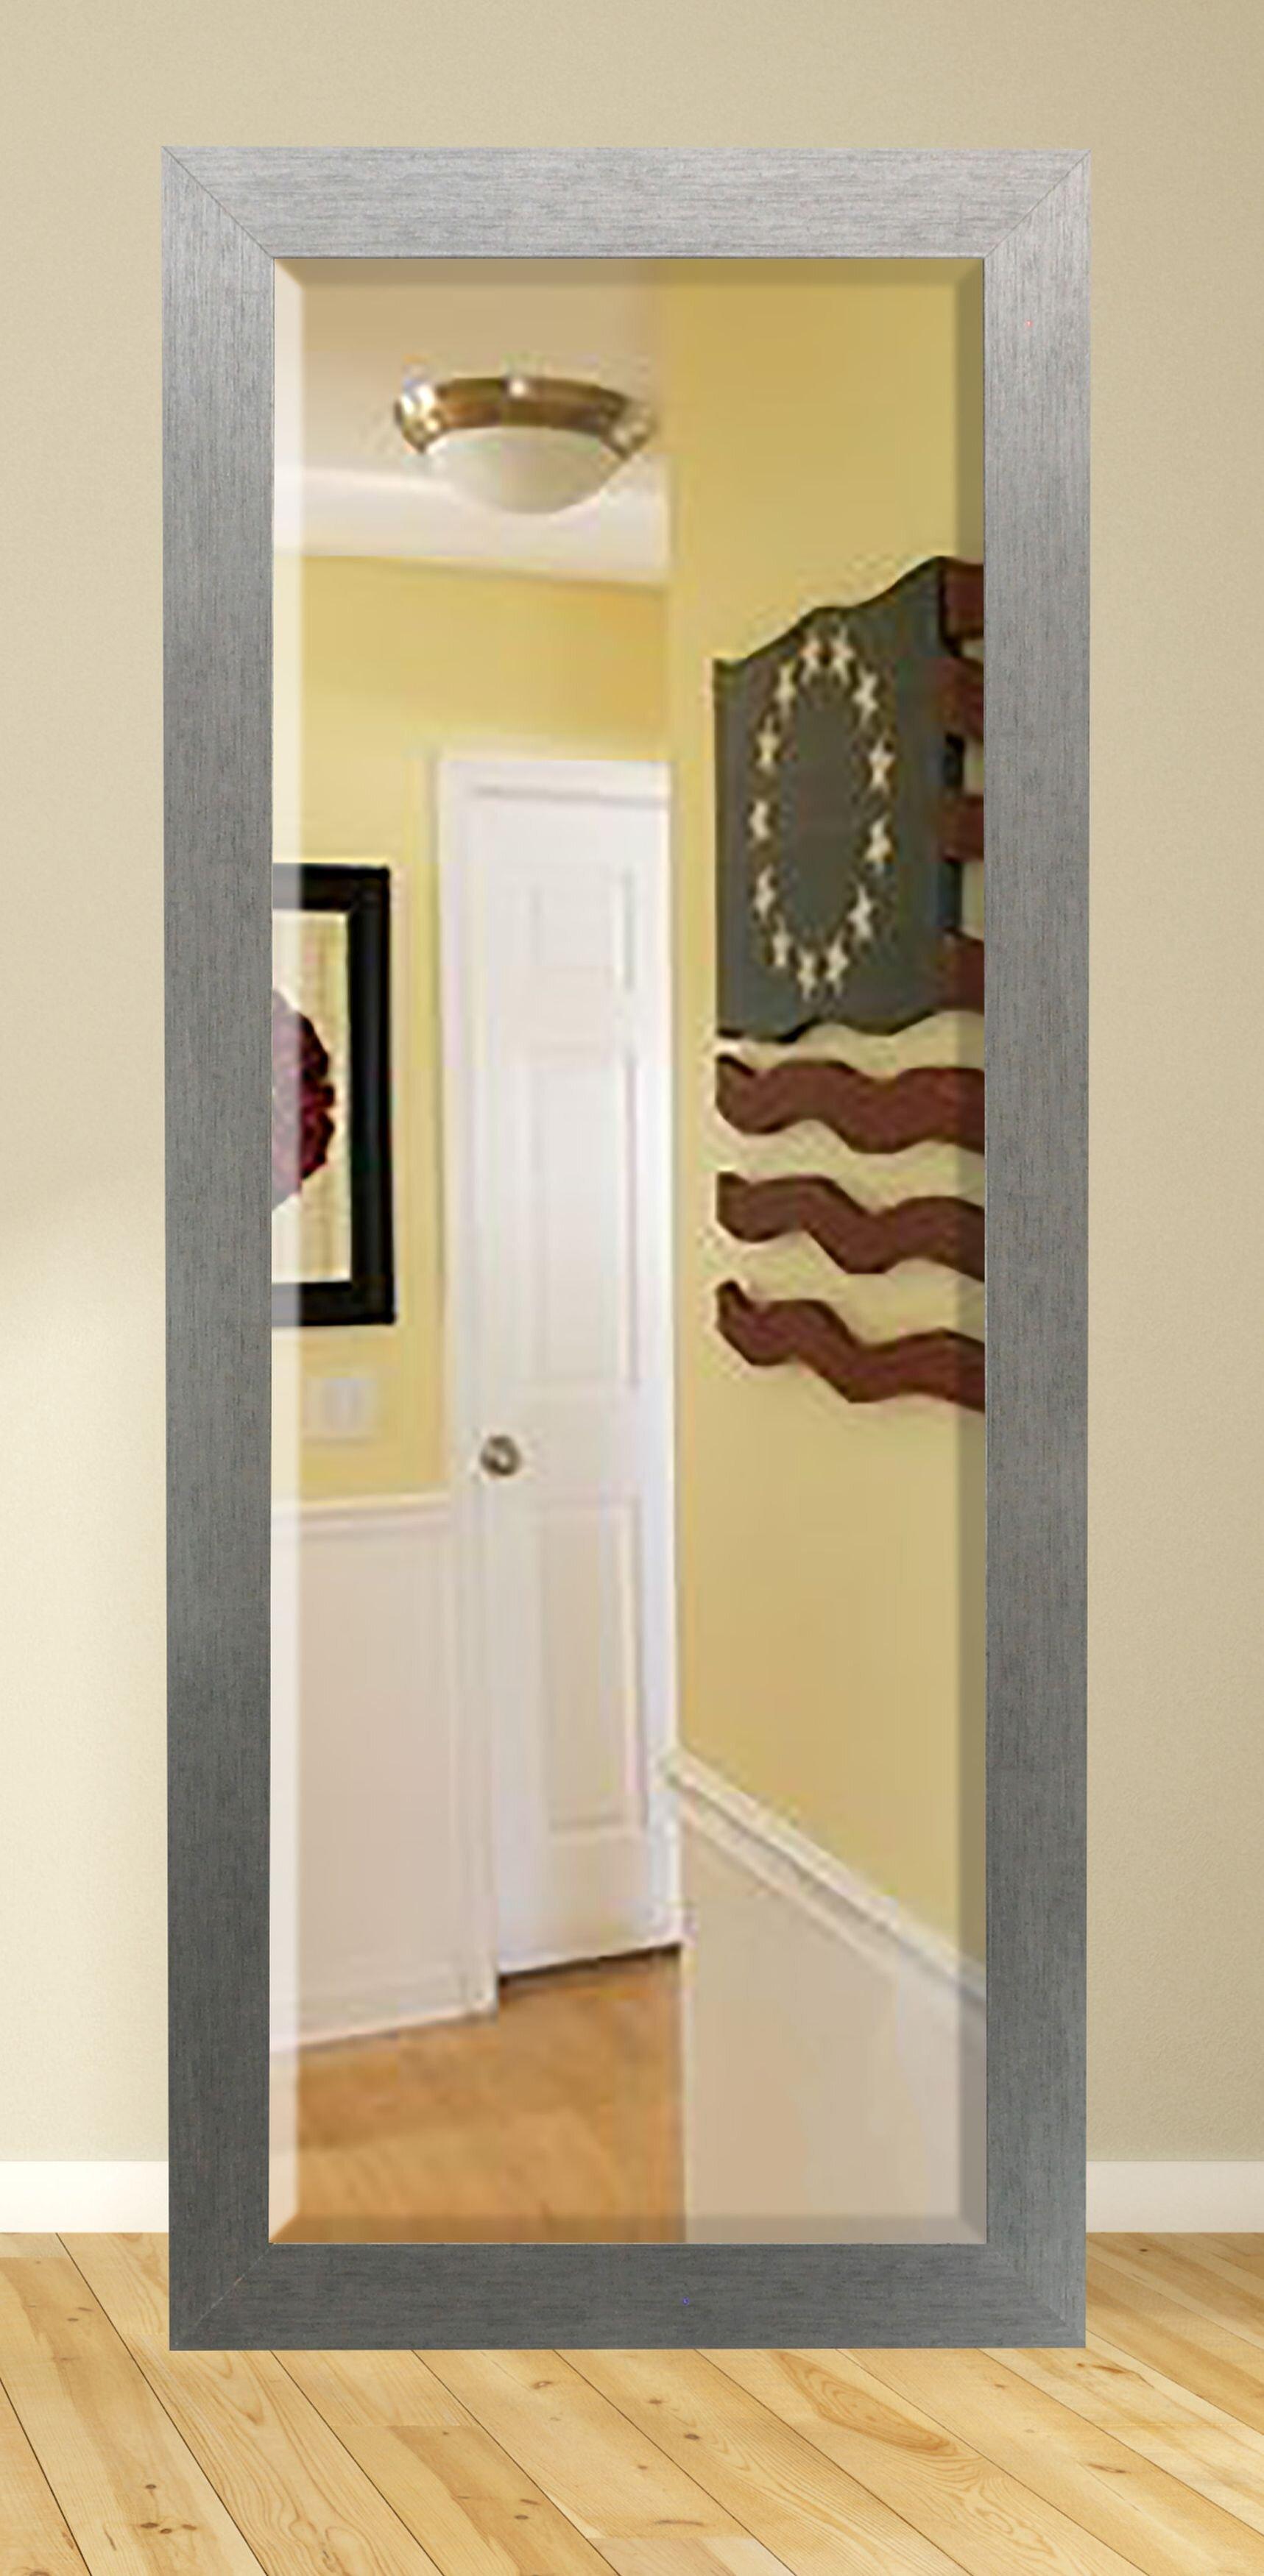 Famous Decorative Full Length Wall Mirror Photos - The Wall Art ...